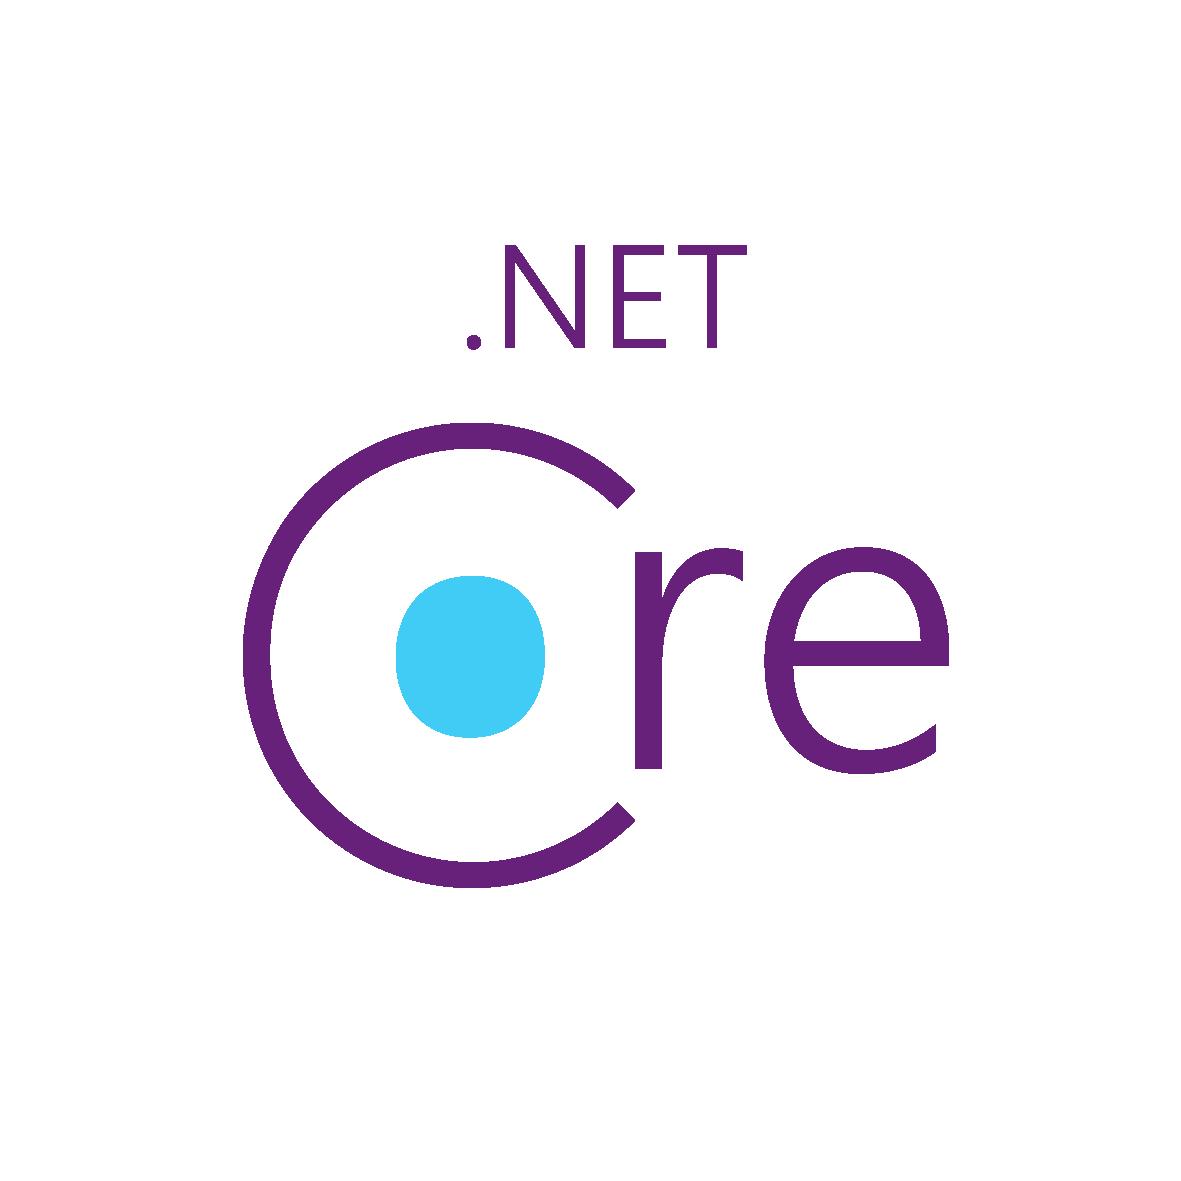 https://raw.githubusercontent.com/campusMVP/dotnetCoreLogoPack/master/.NET%20Core/Bitmap%20RGB/Bitmap-BIG_NET-Core-Logo_2colors_Square_RGB.png